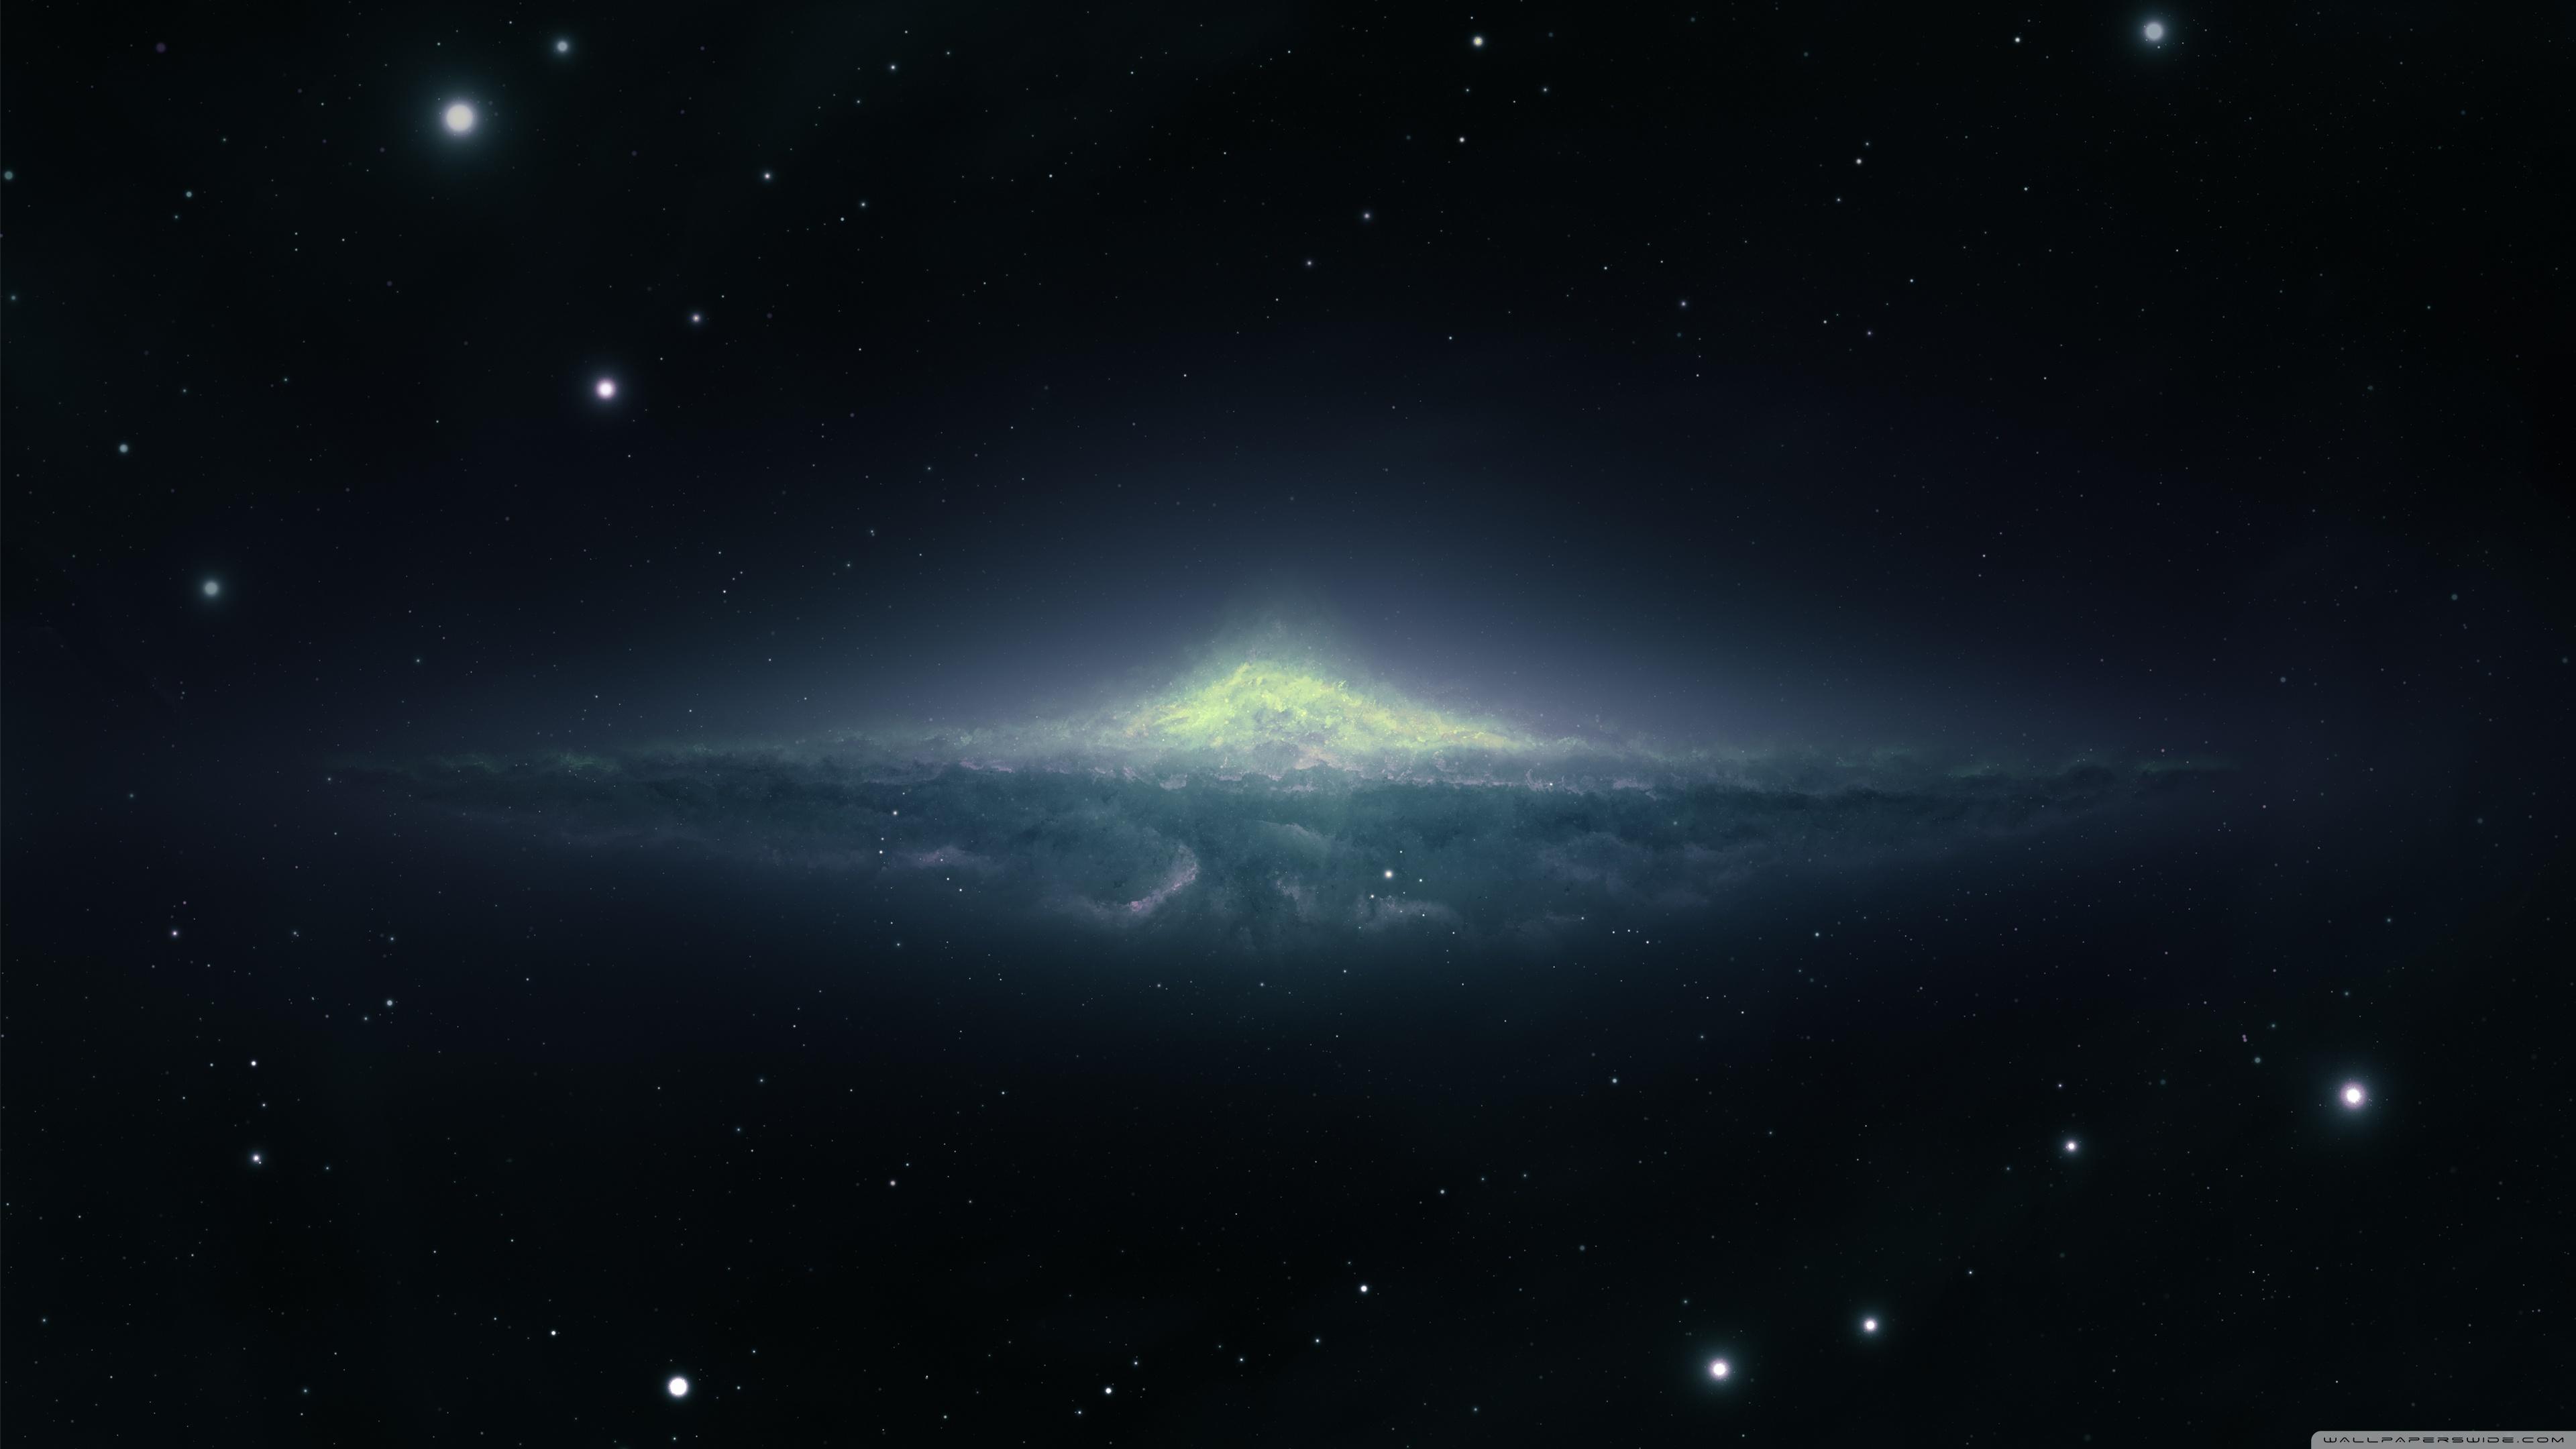 Andromeda Galaxy Uhd Wallpaper - Galaxy 4k Wallpaper For Pc , HD Wallpaper & Backgrounds